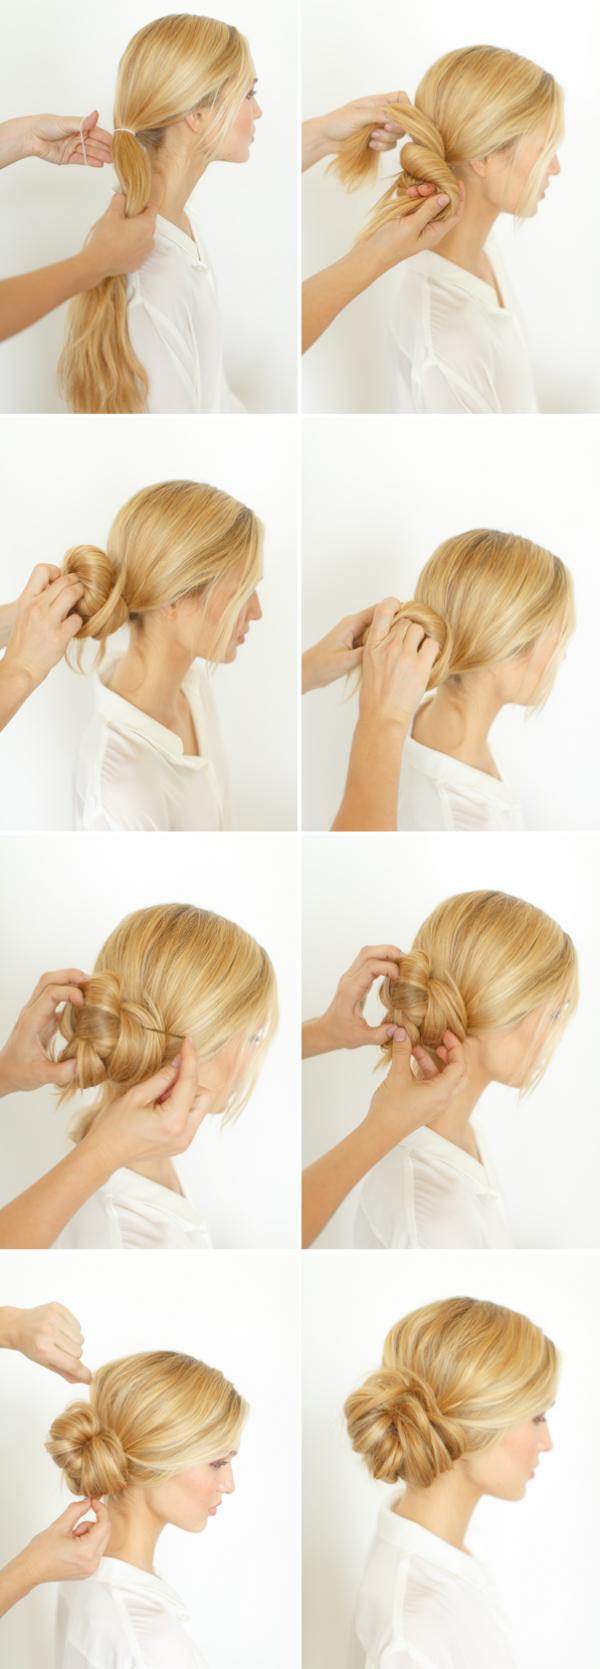 Diy Knotted Bun Wedding Hairstyle Wedding Hair Updo Ideas Bun Hairstyles For Long Hair Hair Bun Tutorial Hair Styles